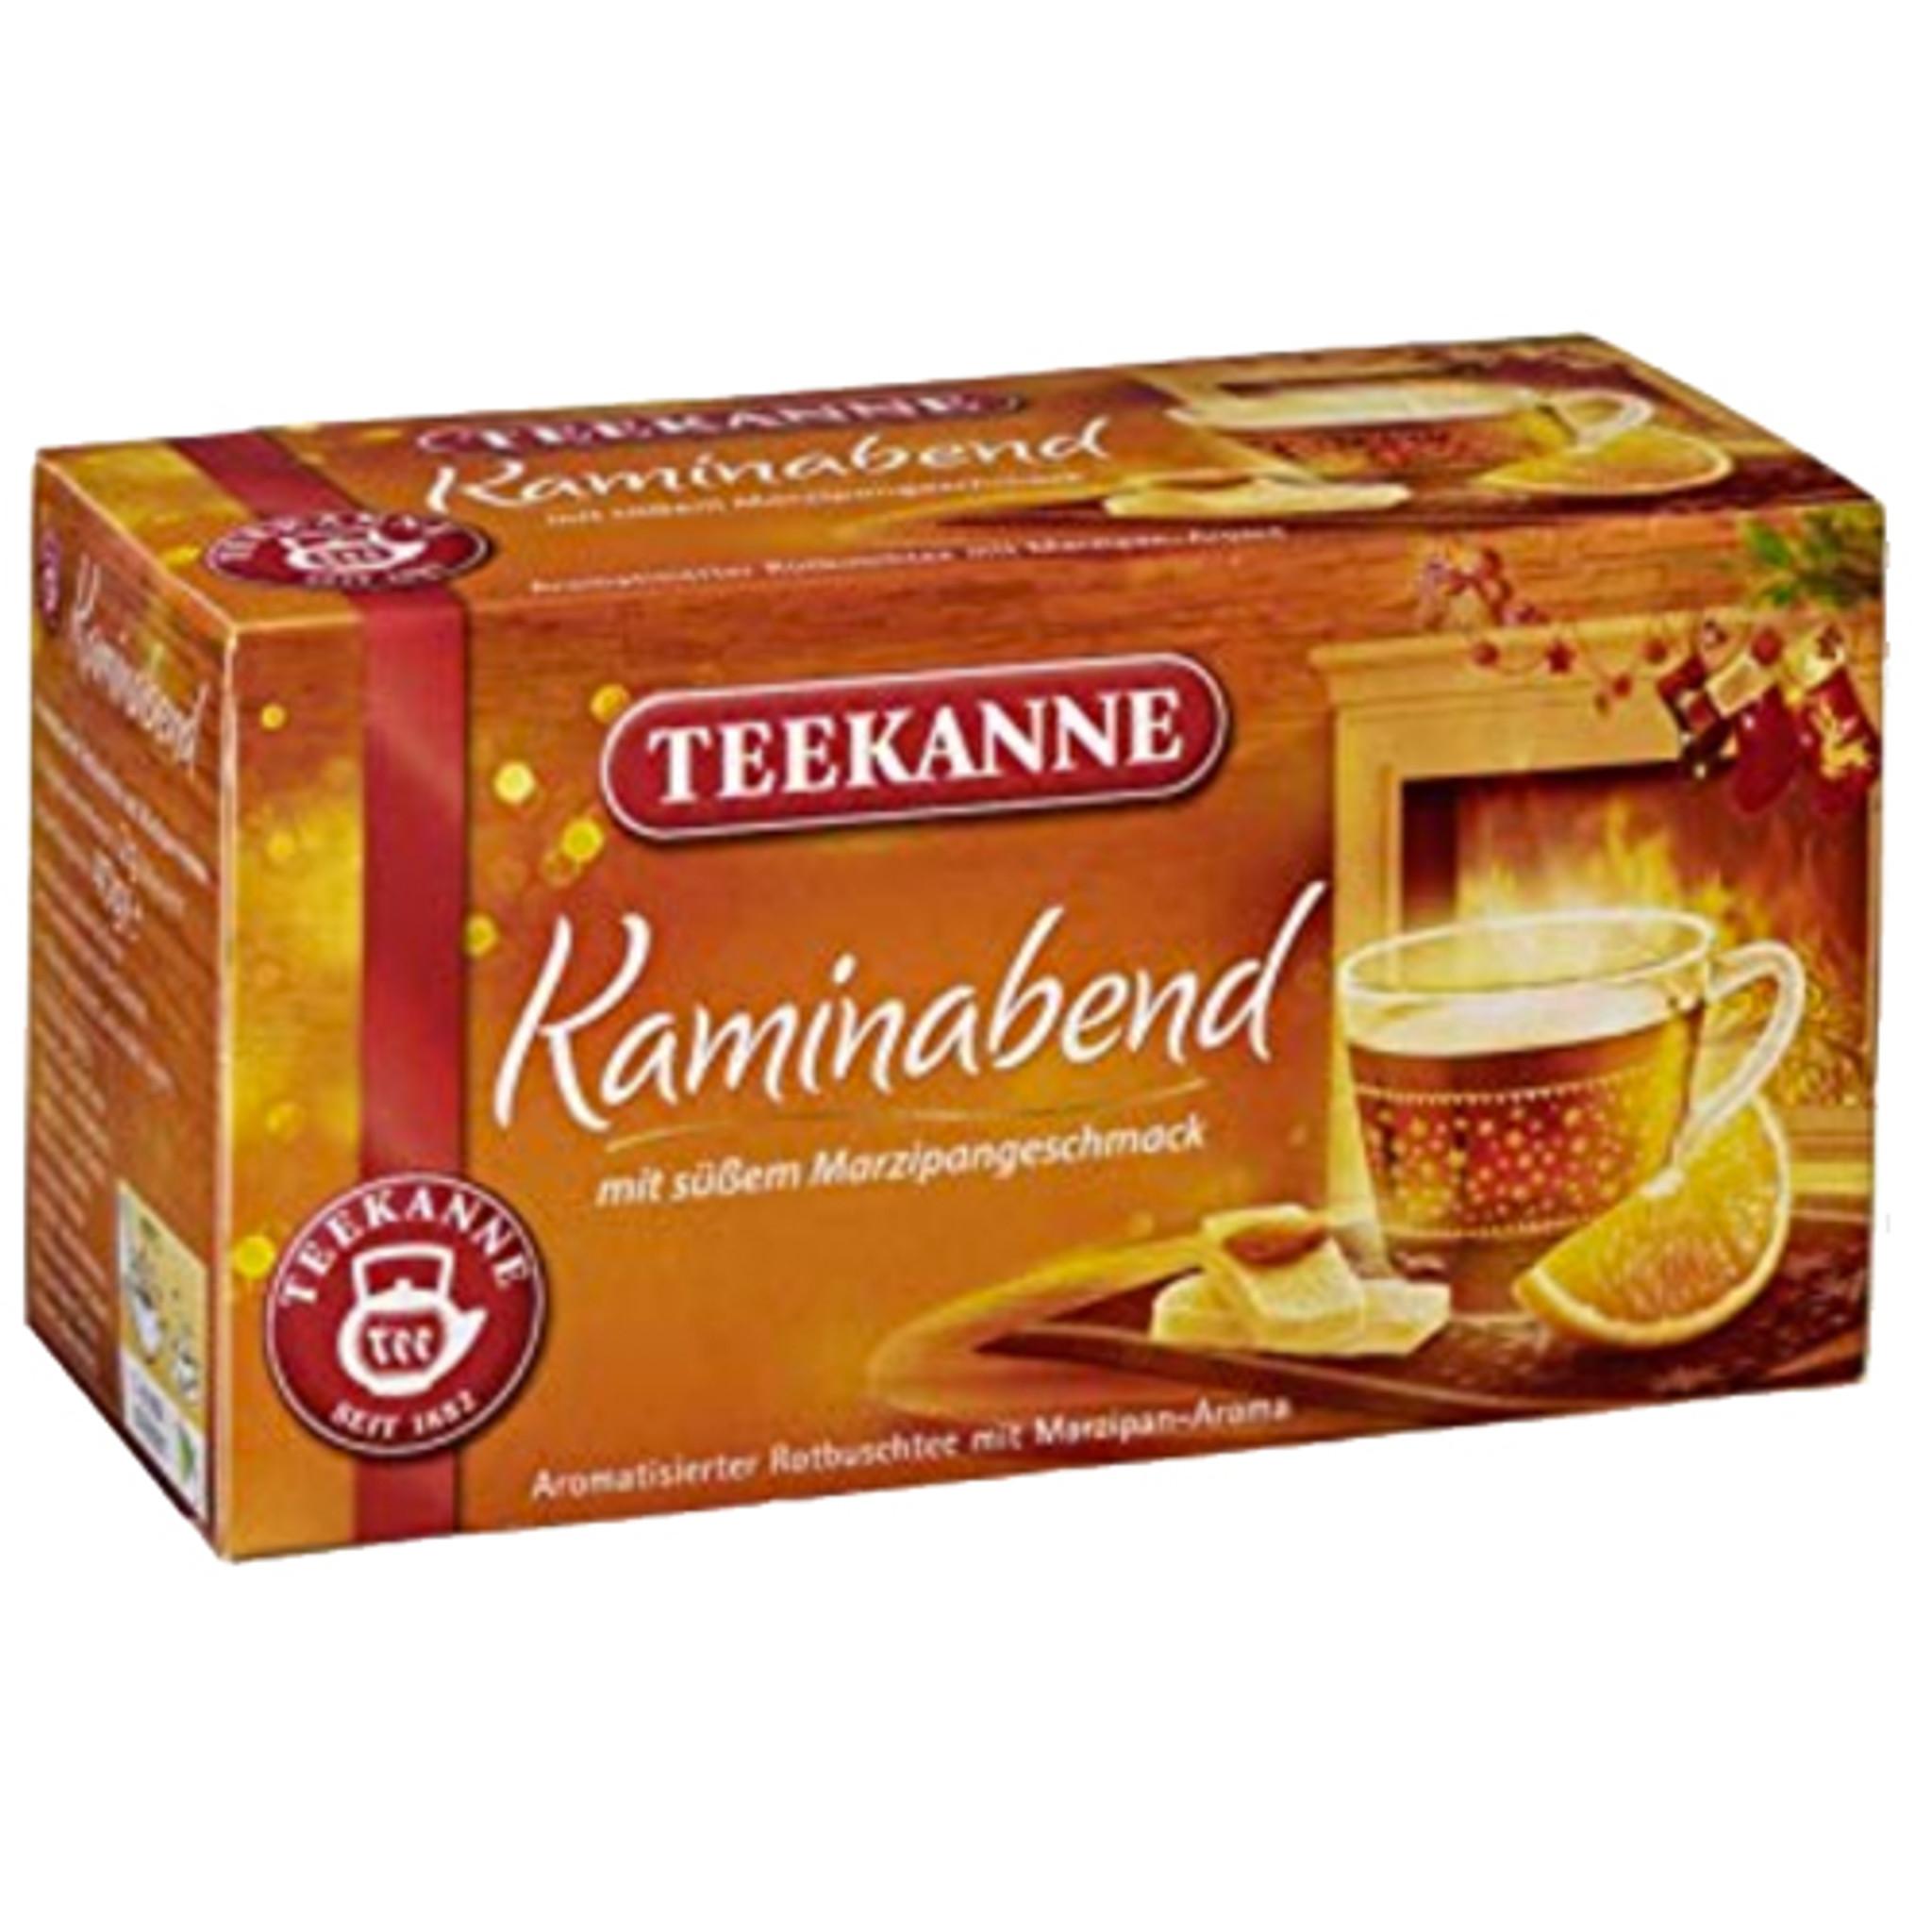 Teekanne Rooibos Tea Mix With Orange Cinnamon Marzipan In Bags 1 0 Oz